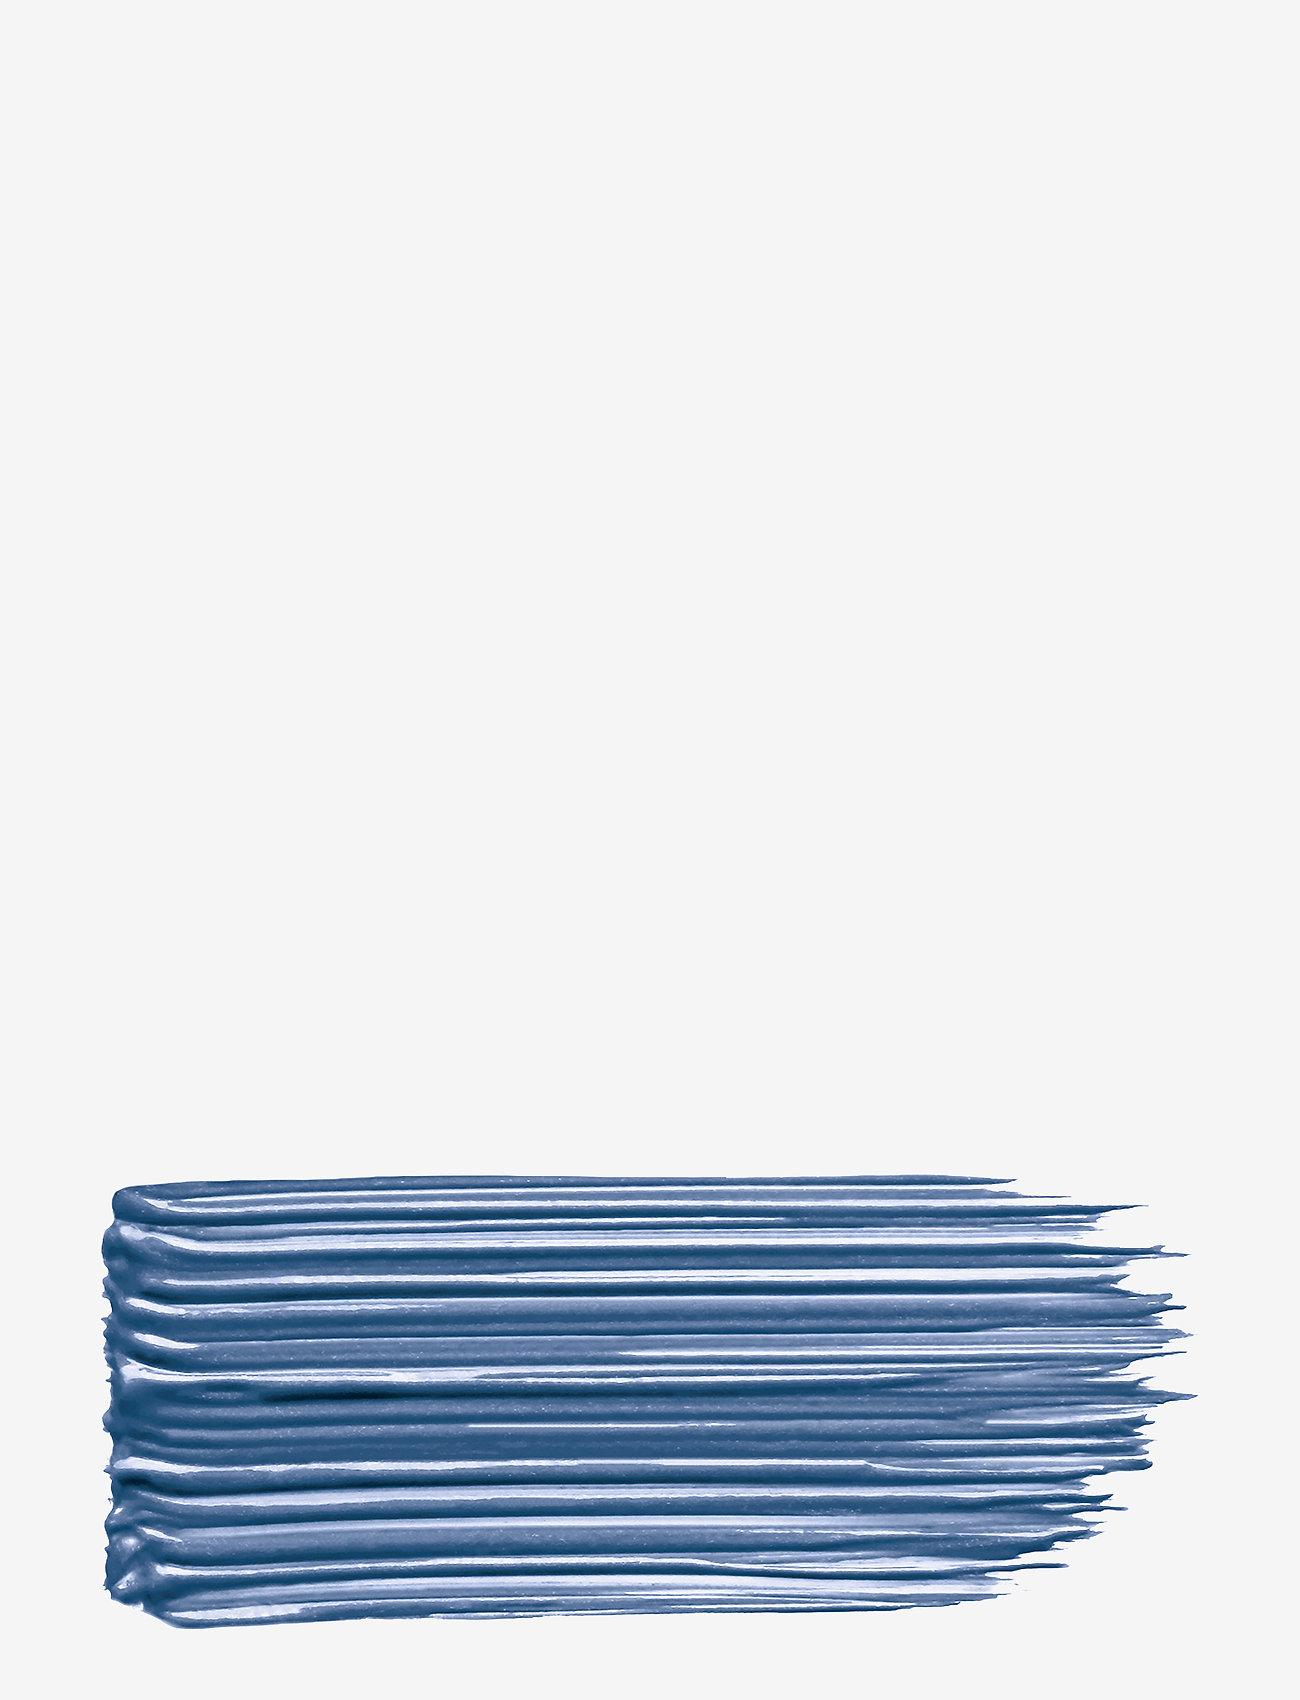 Yves Saint Laurent - Mascara Volume Effet Faux Cils - mascara - 6 nuit intense - 1